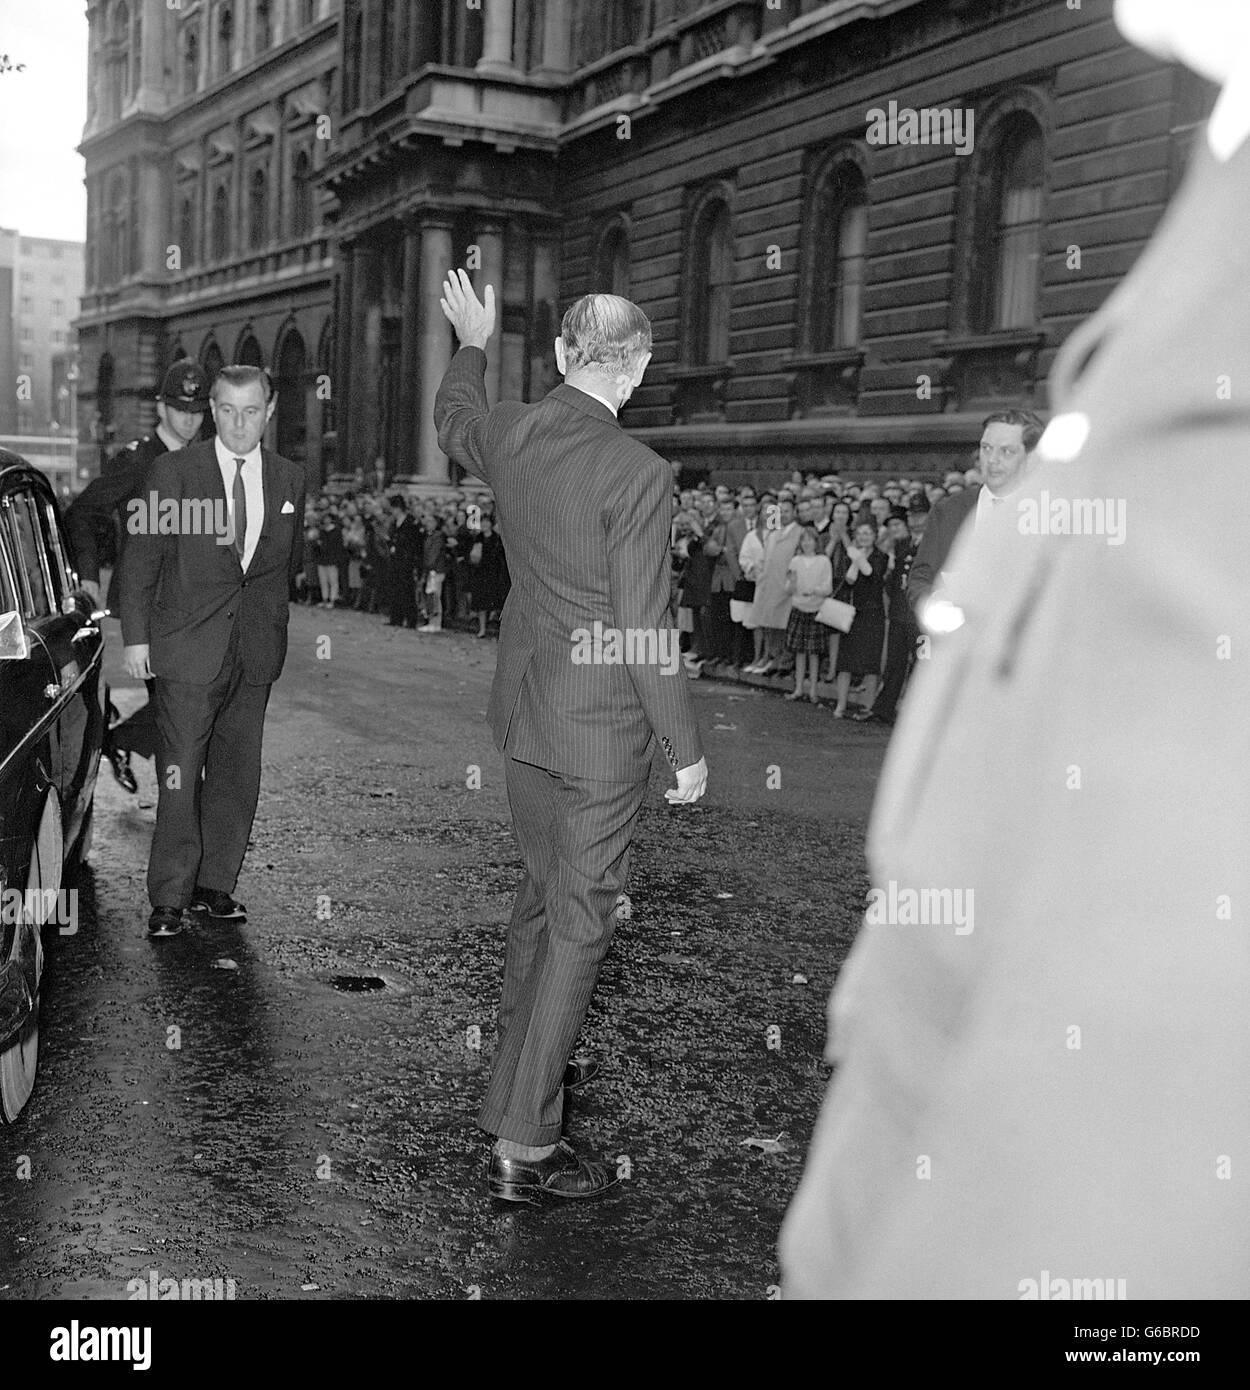 Politics - Harold Macmillan's resignation - New Prime Minister Lord Home - Downing Street, London - Stock Image